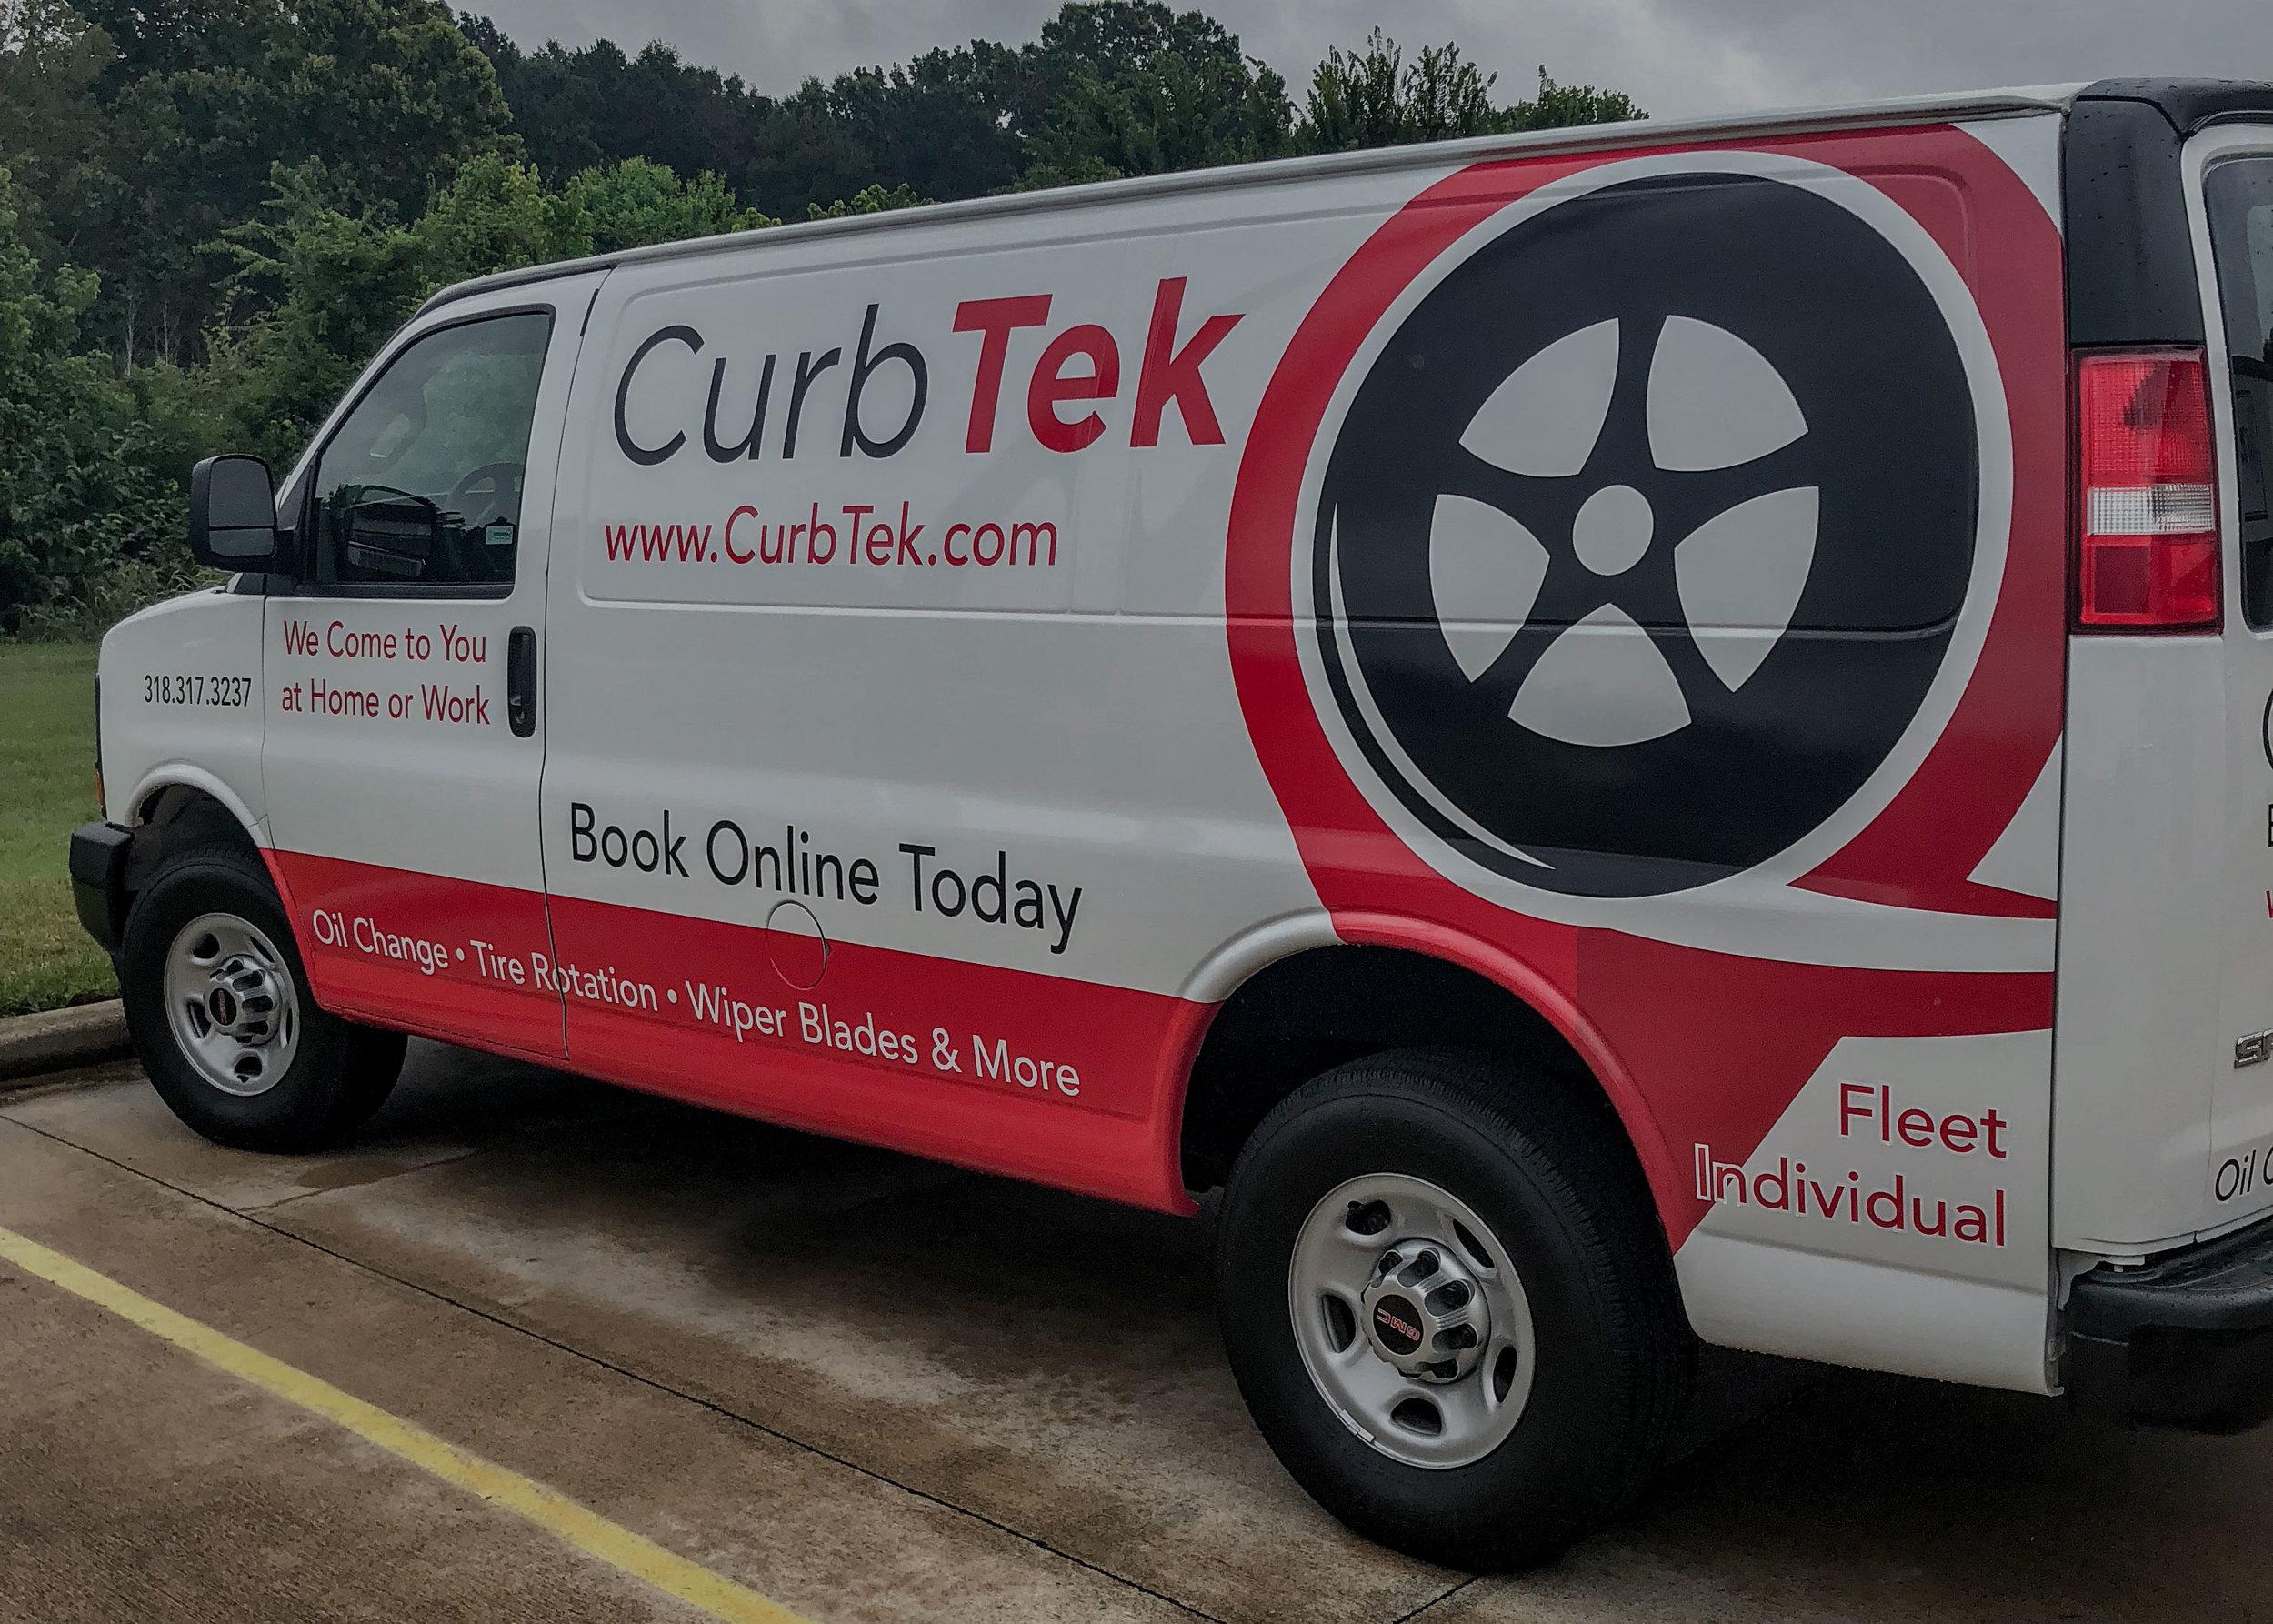 Fleet & Individuals - We service both fleet customers AND individuals wherever is convenient.